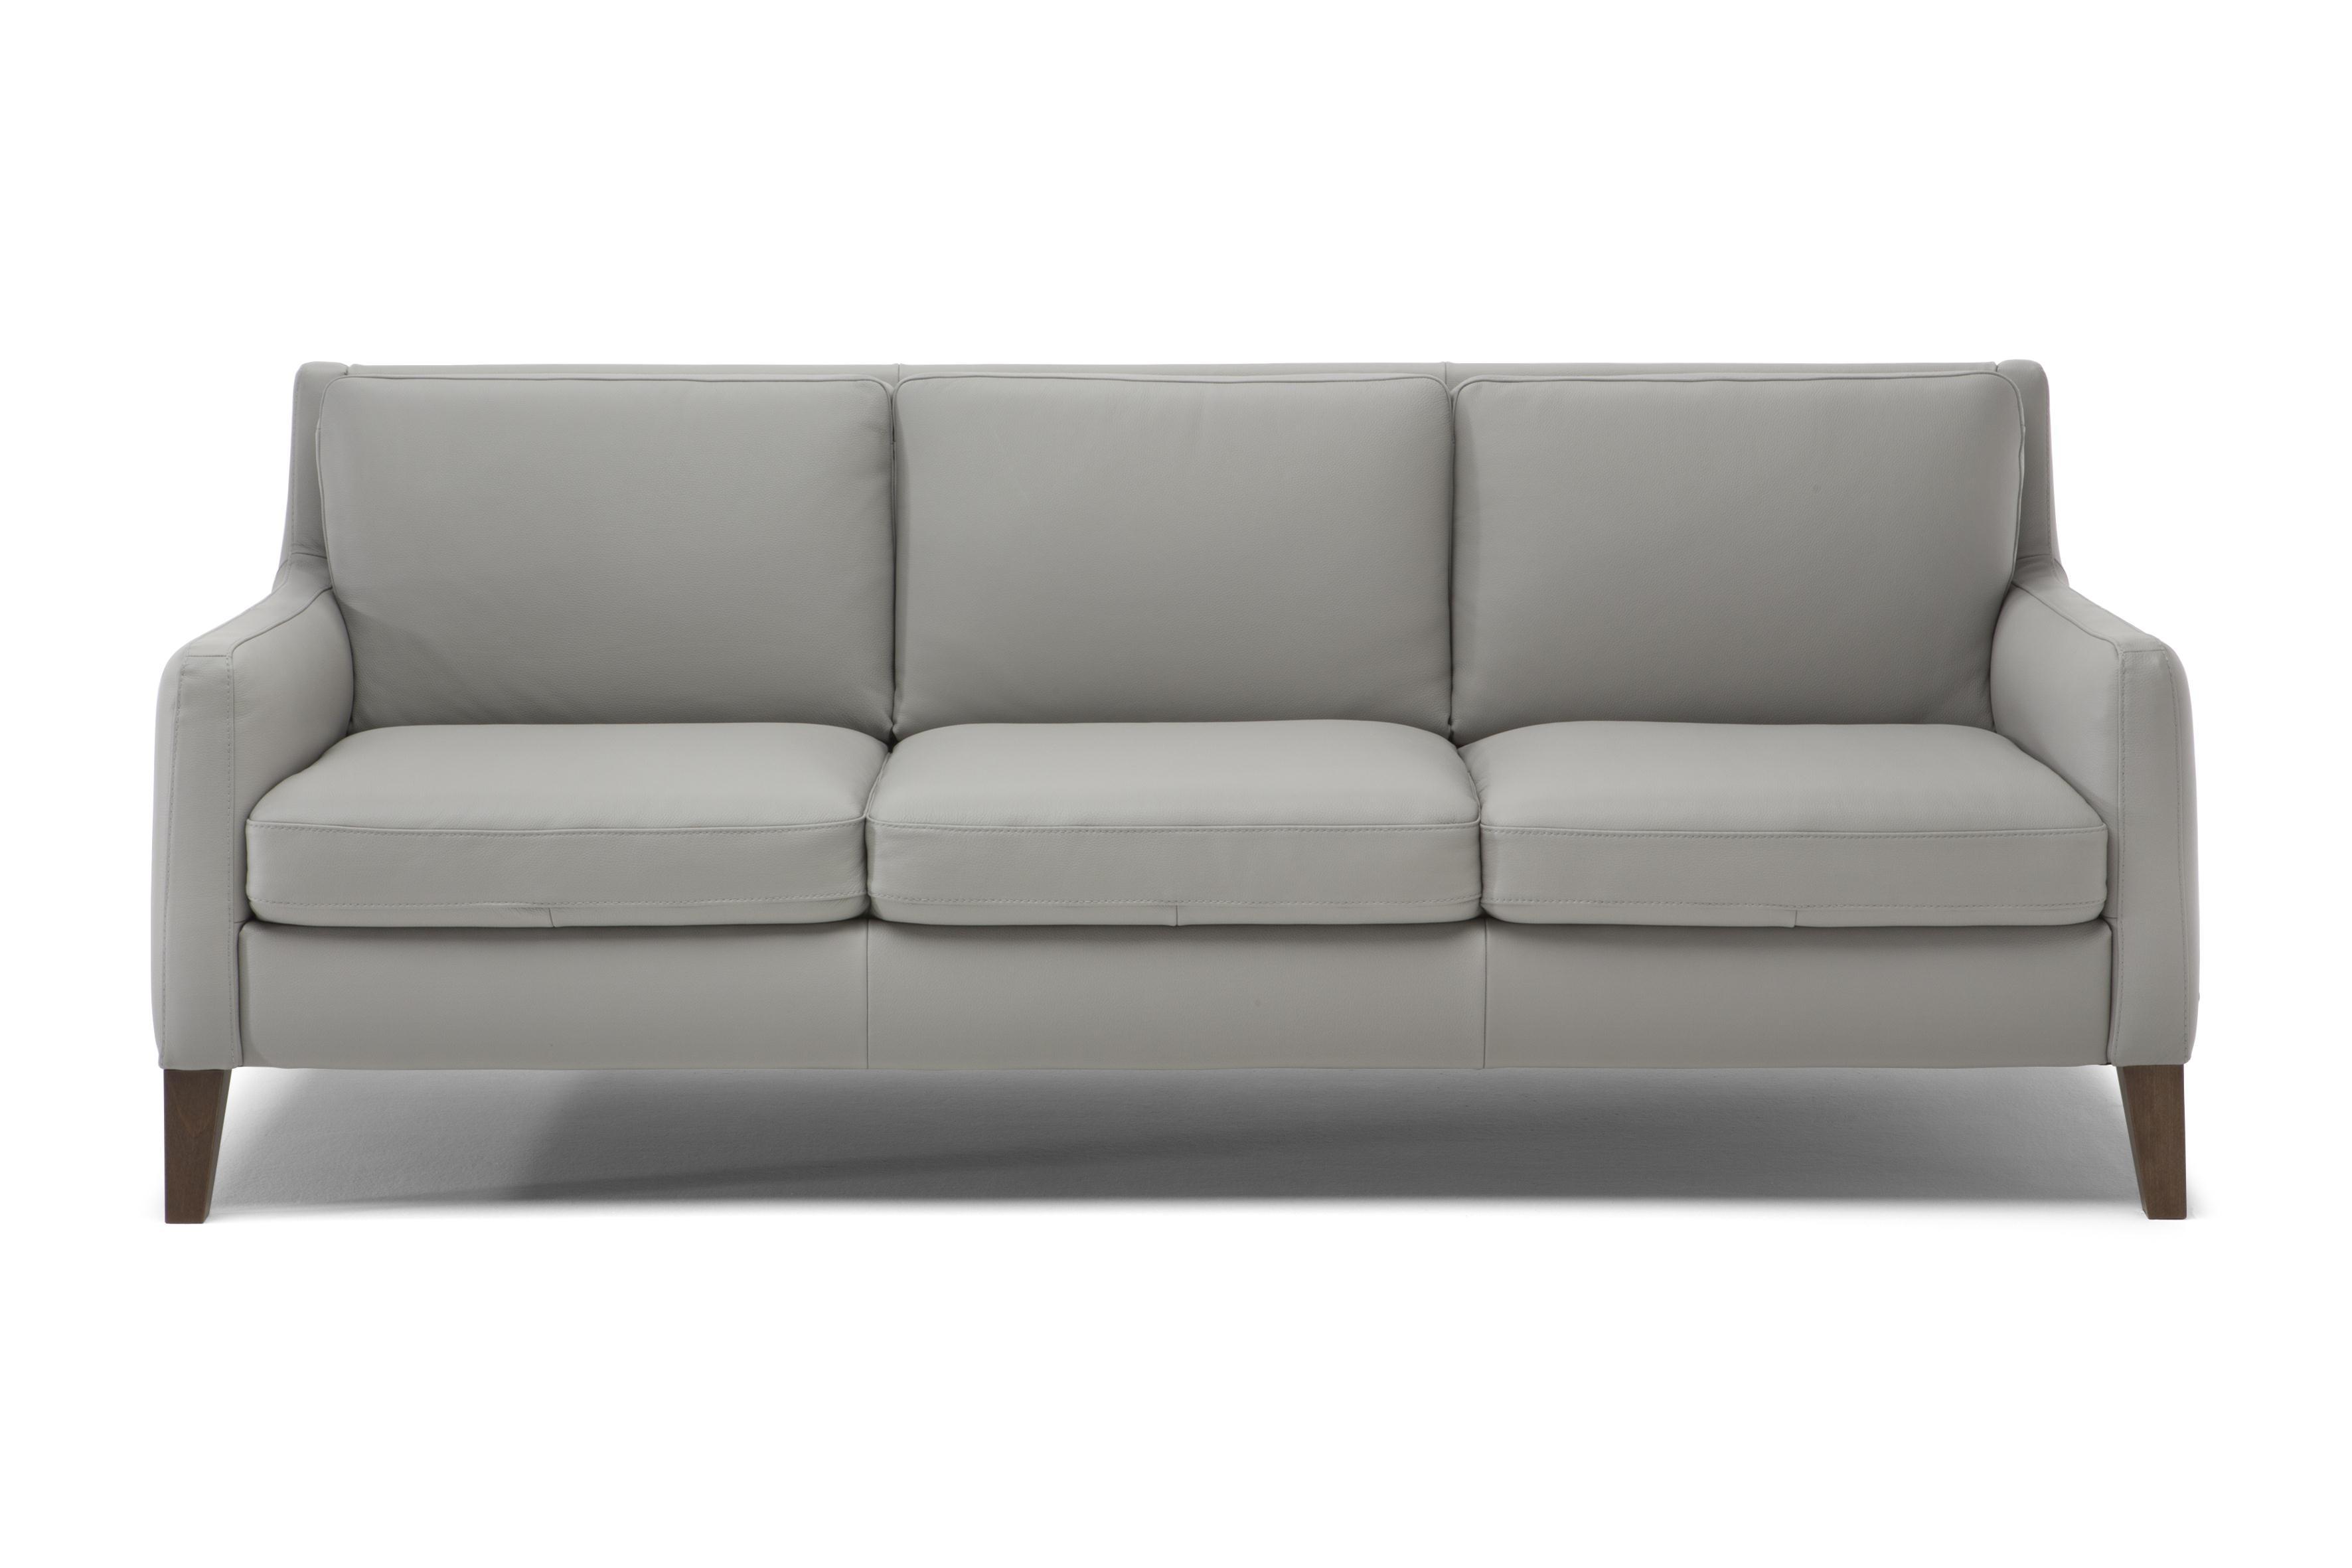 Genial C009 064. Leather Sofa